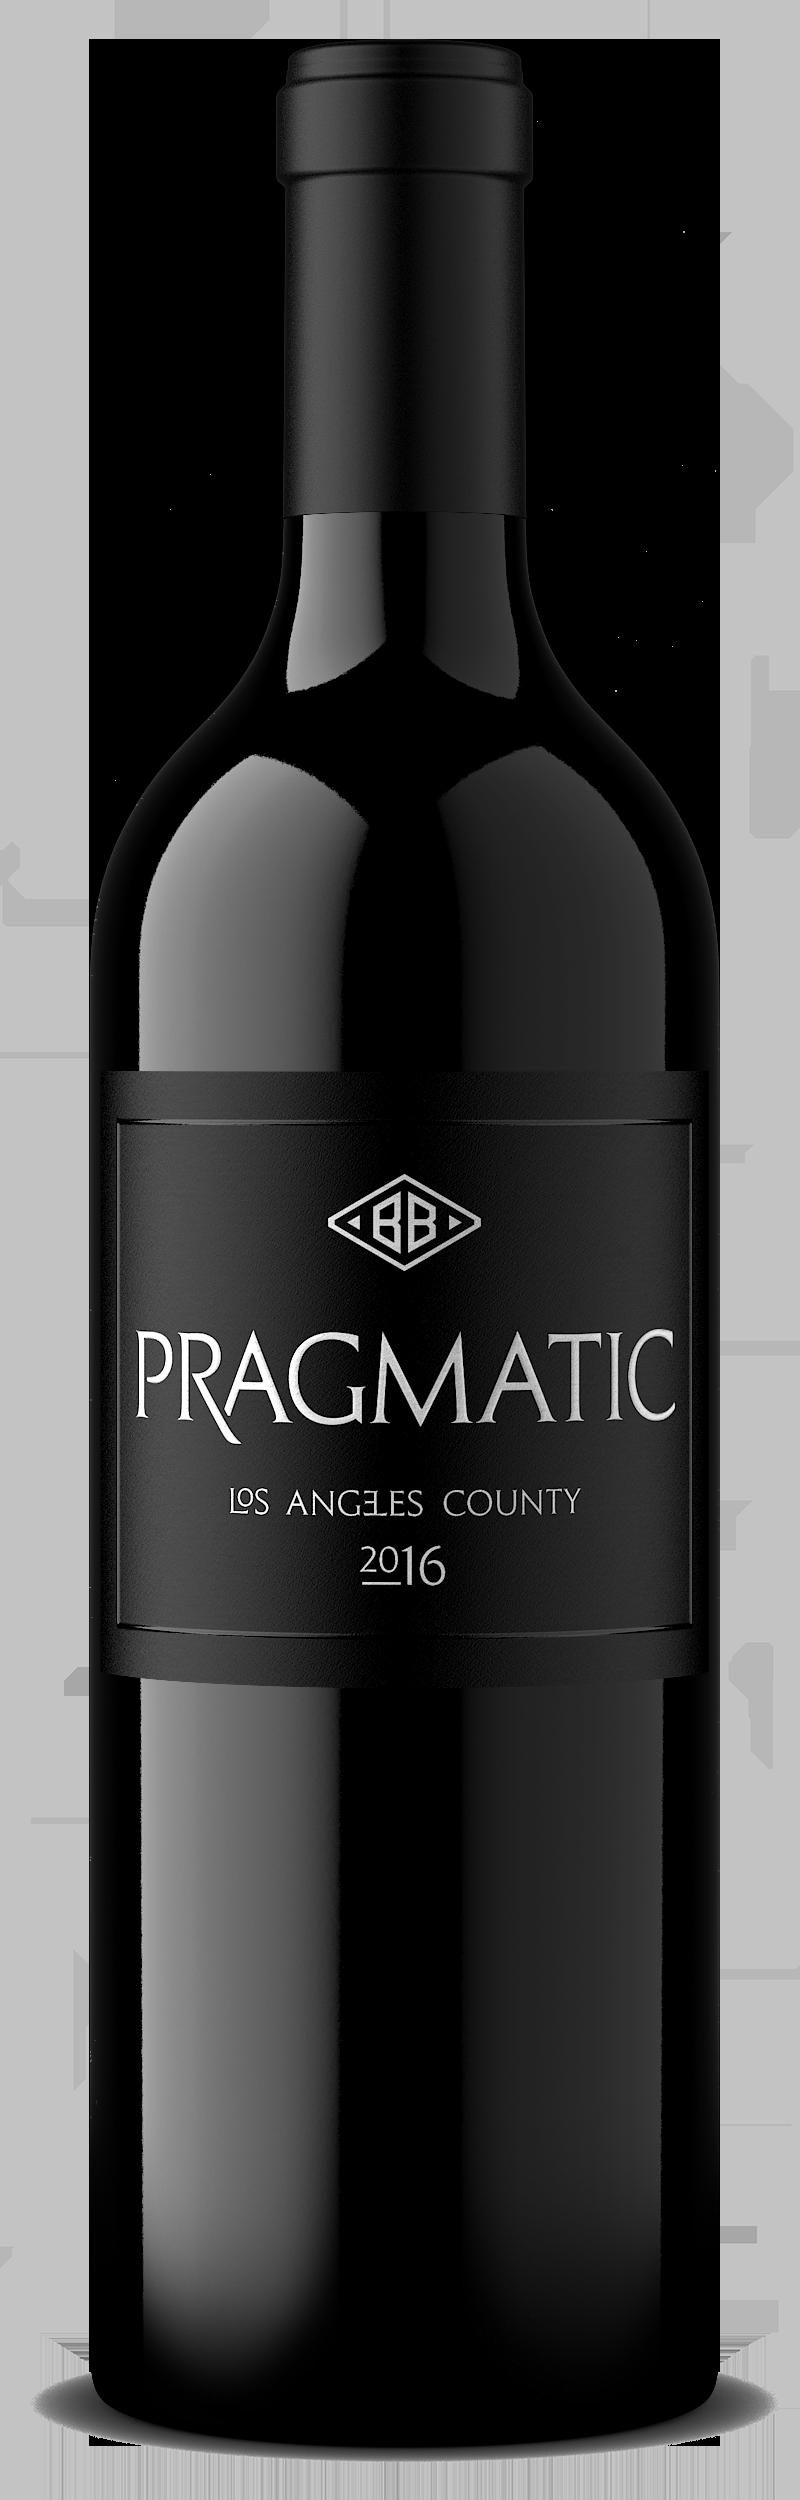 ByronBlatty-Pragmatic-onBlack.png